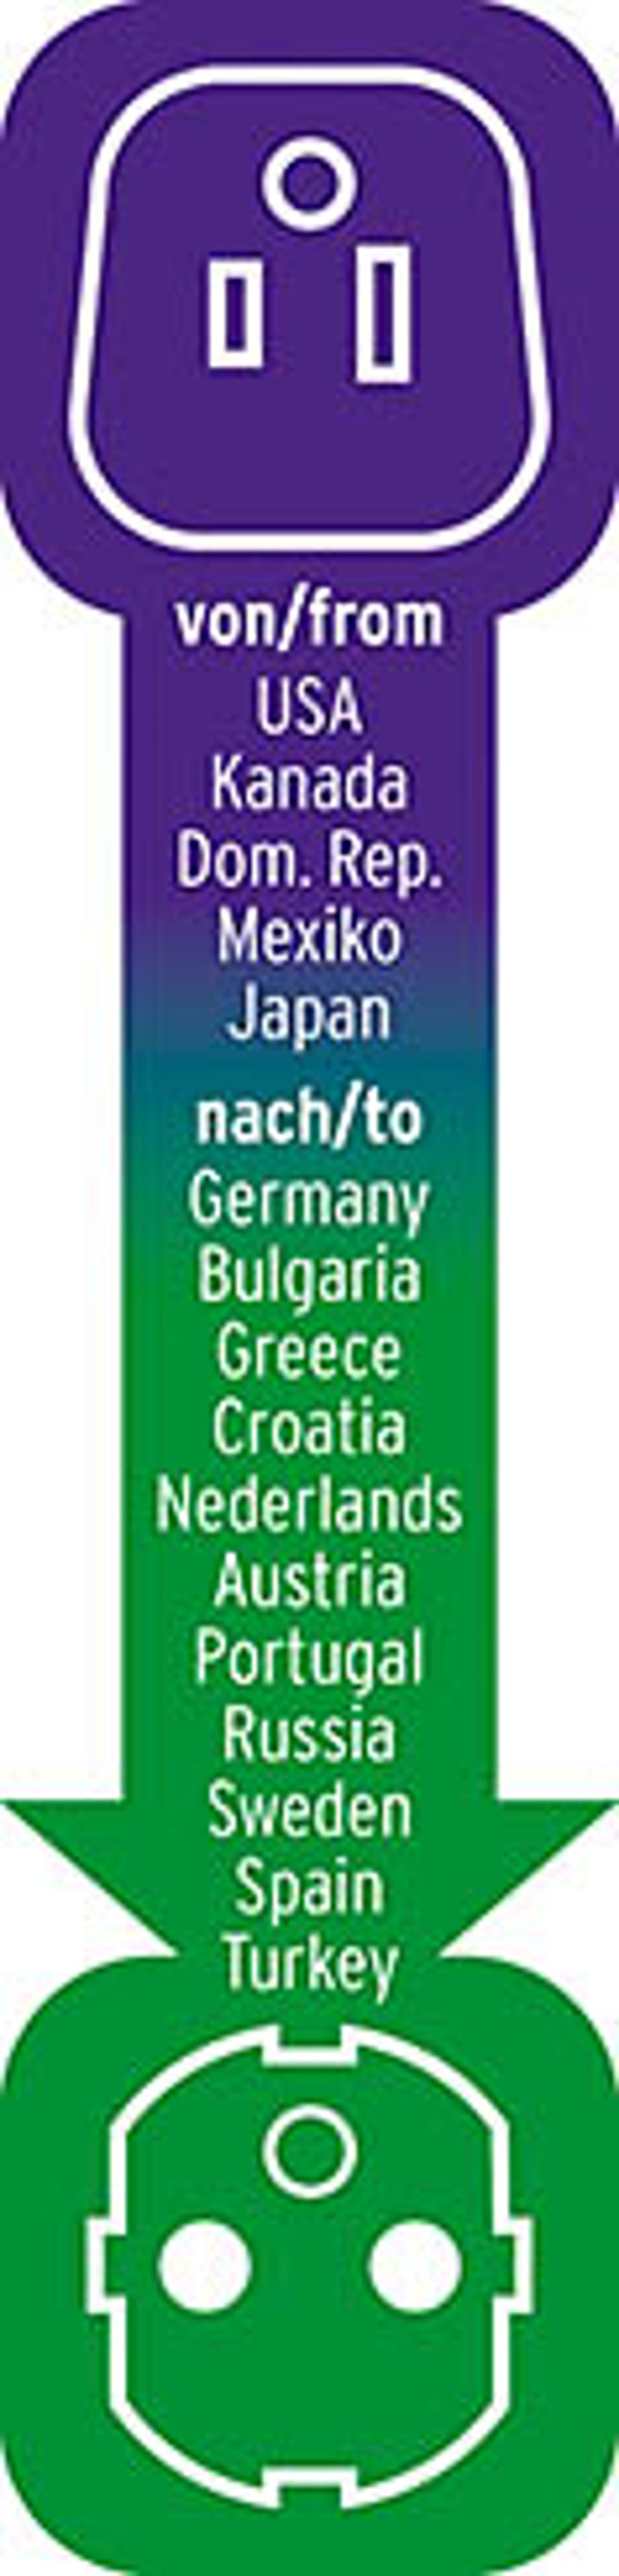 Brennenstuhl Travel Adapter